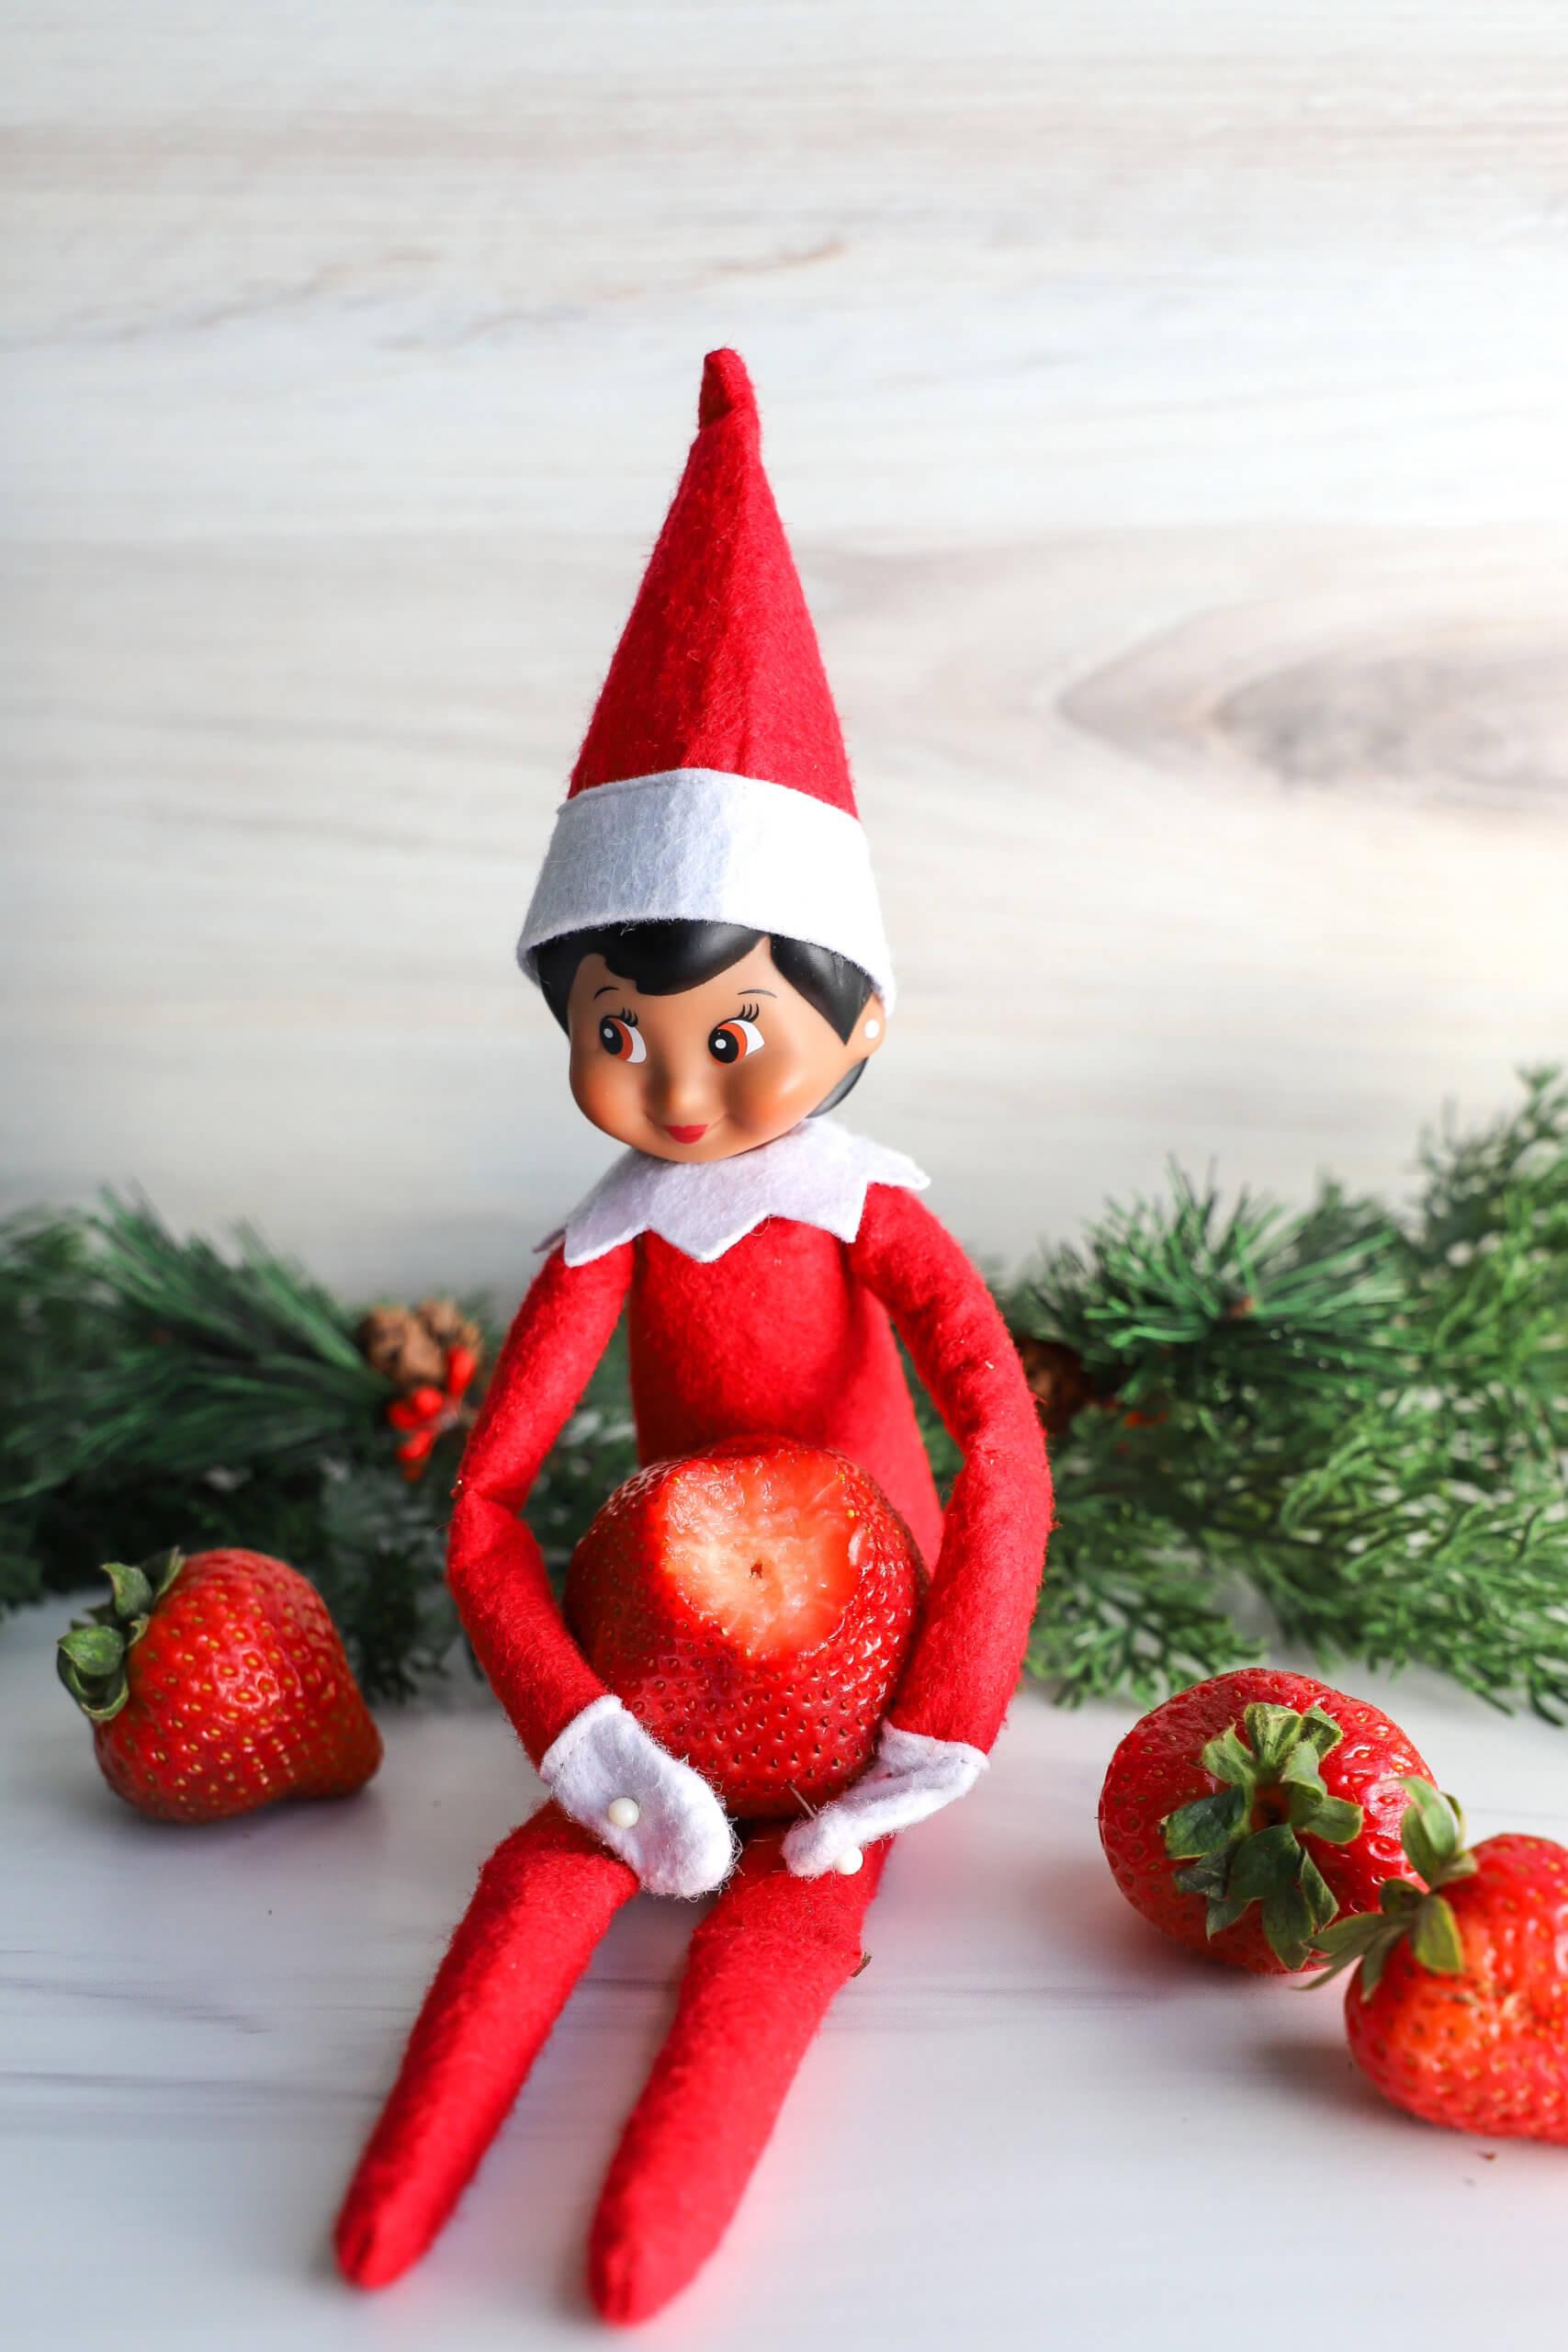 Easy Elf on the Shelf Idea: Eating strawberries